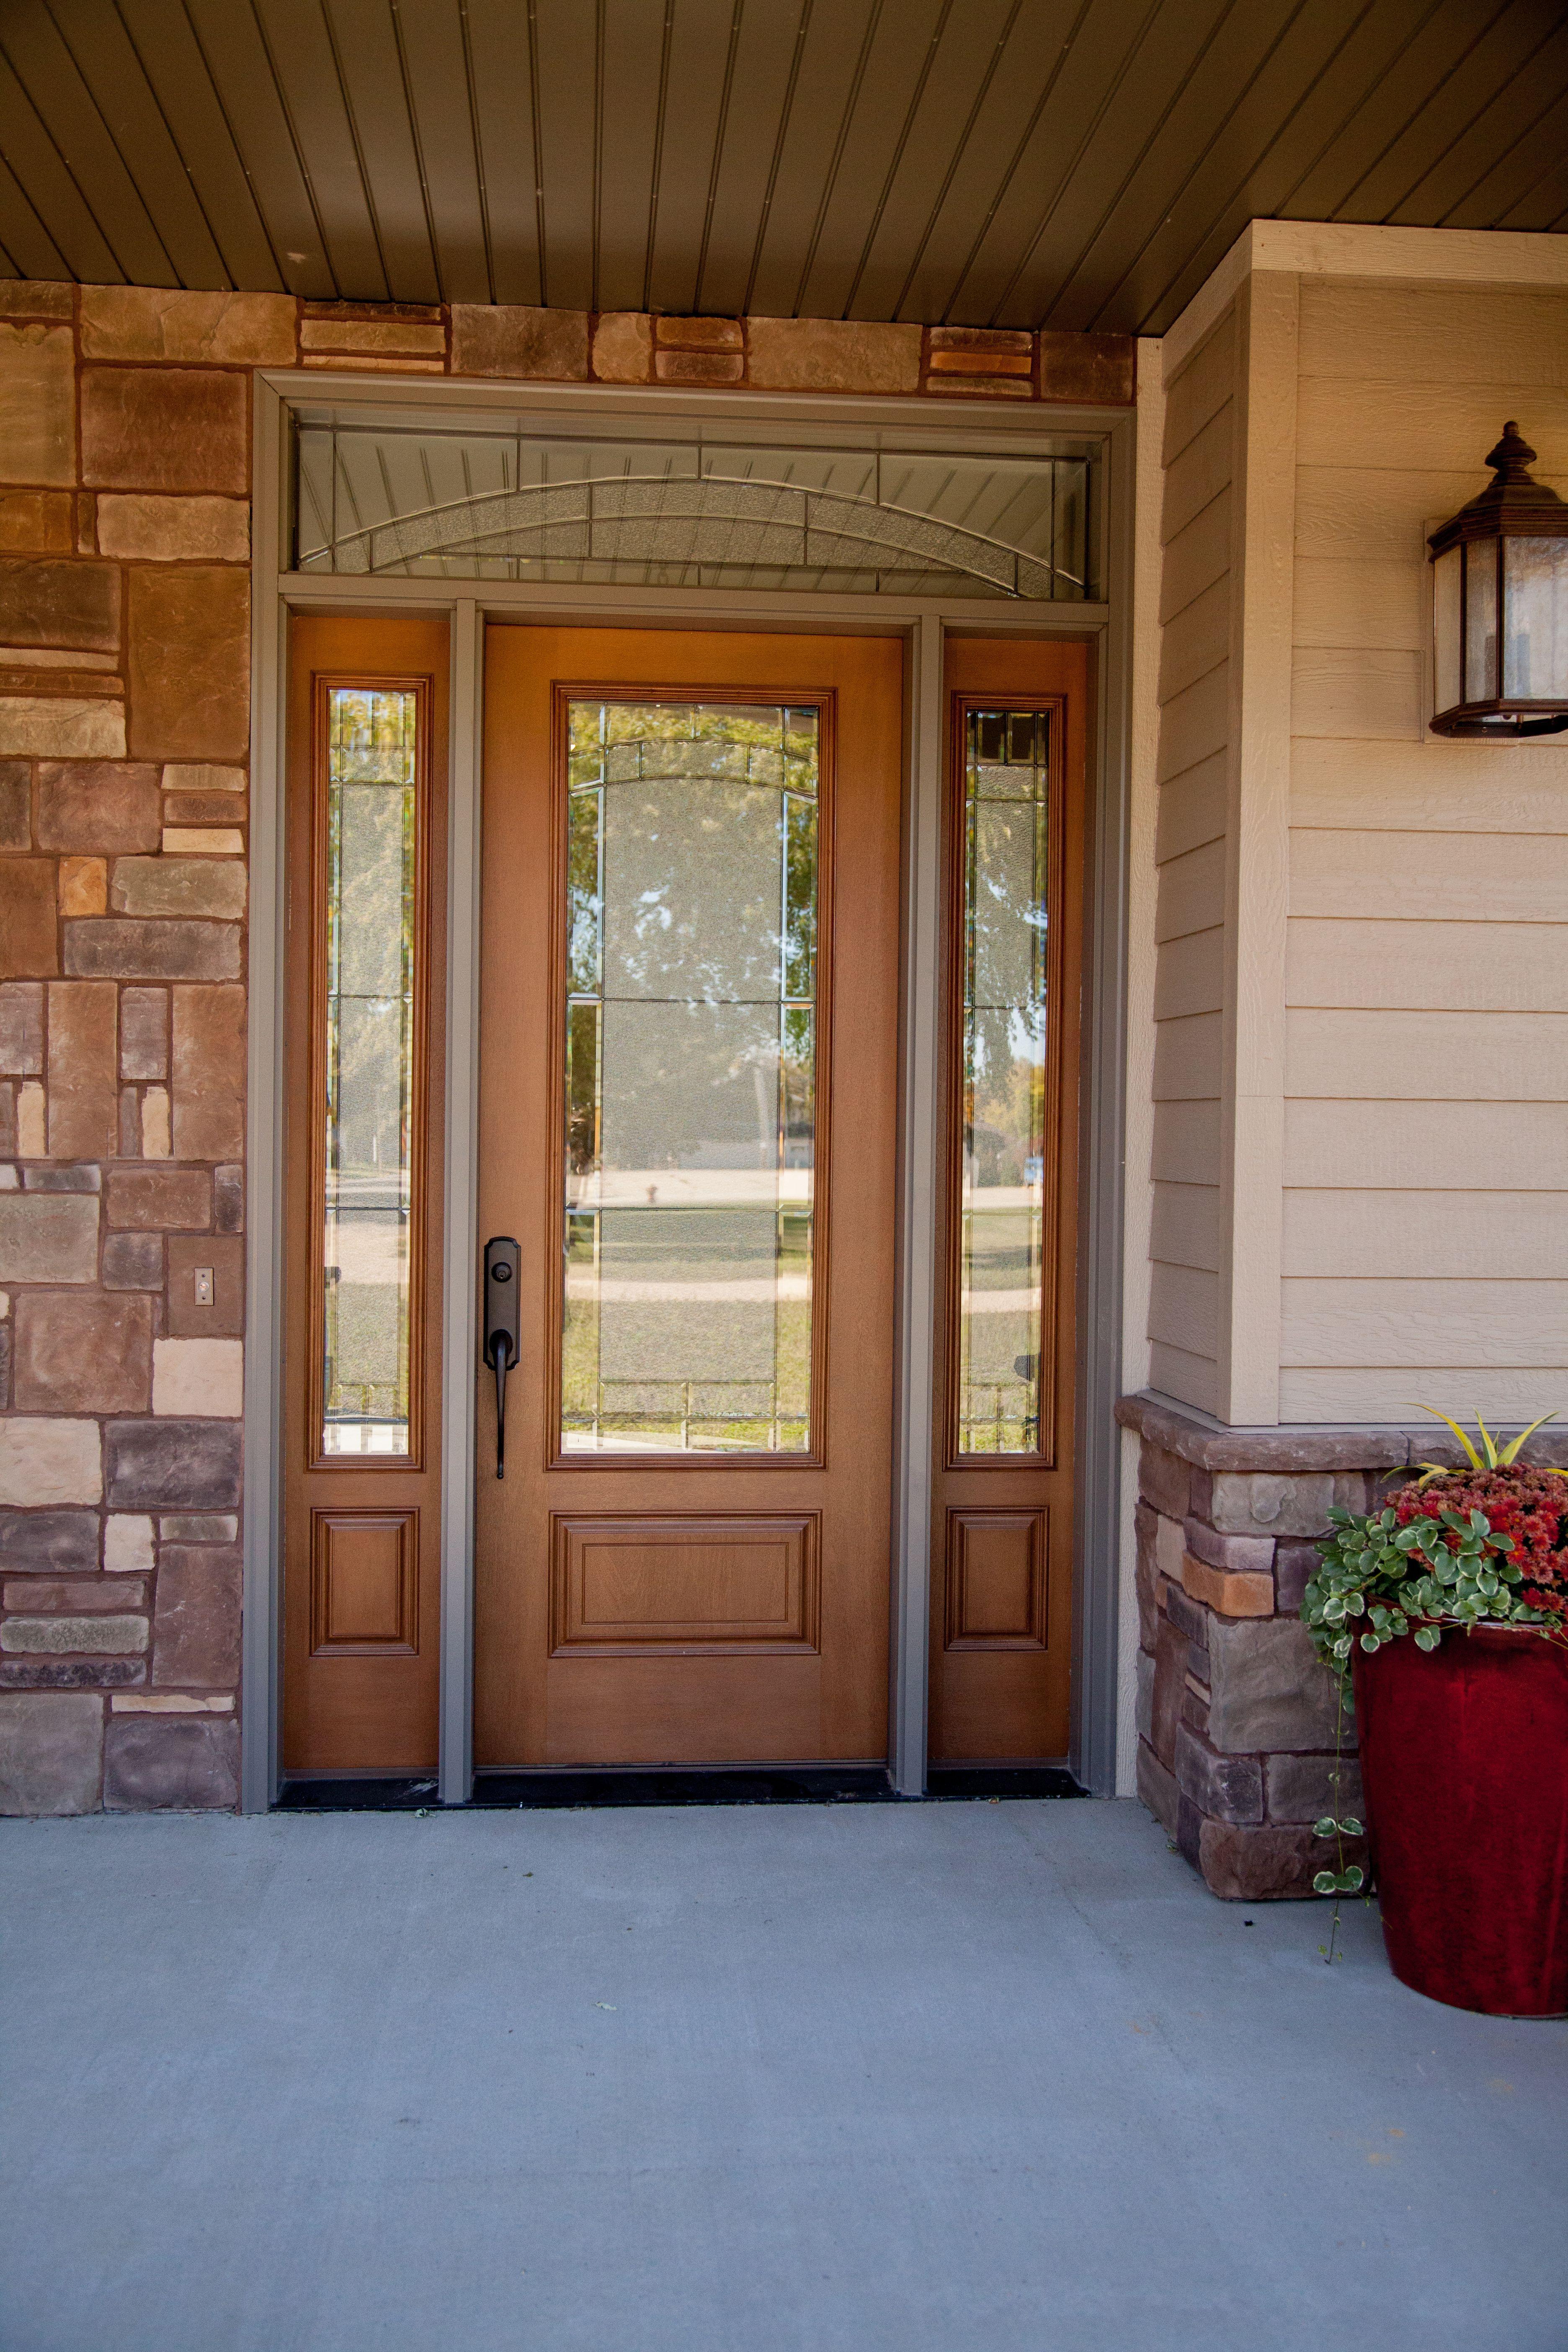 Exterior Doors Fir Fiberglass Three Quarter Light Element Glass With Transom And Sidelites Prefinishe Fiberglass Exterior Doors Exterior Doors House Front